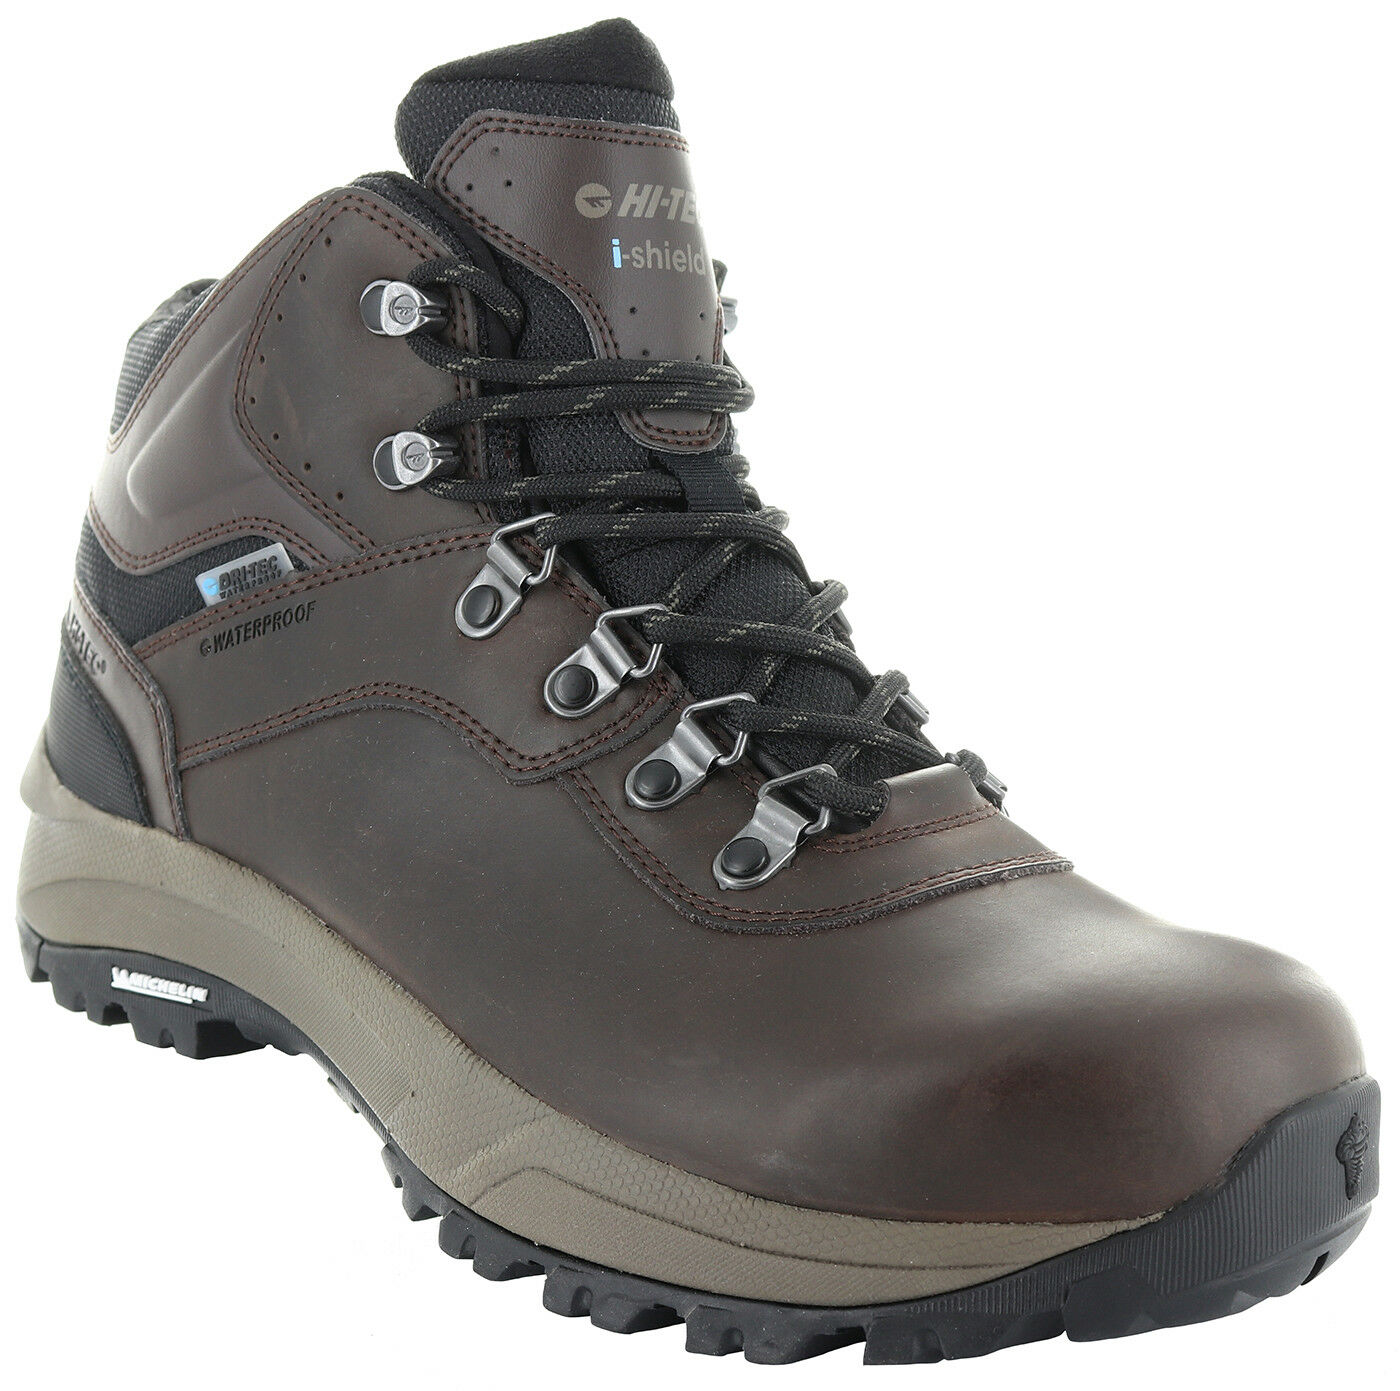 Hi-Tec 52216 Men's Altitude VI-i Dark Chocolate Waterproof Leather Hiking Boots